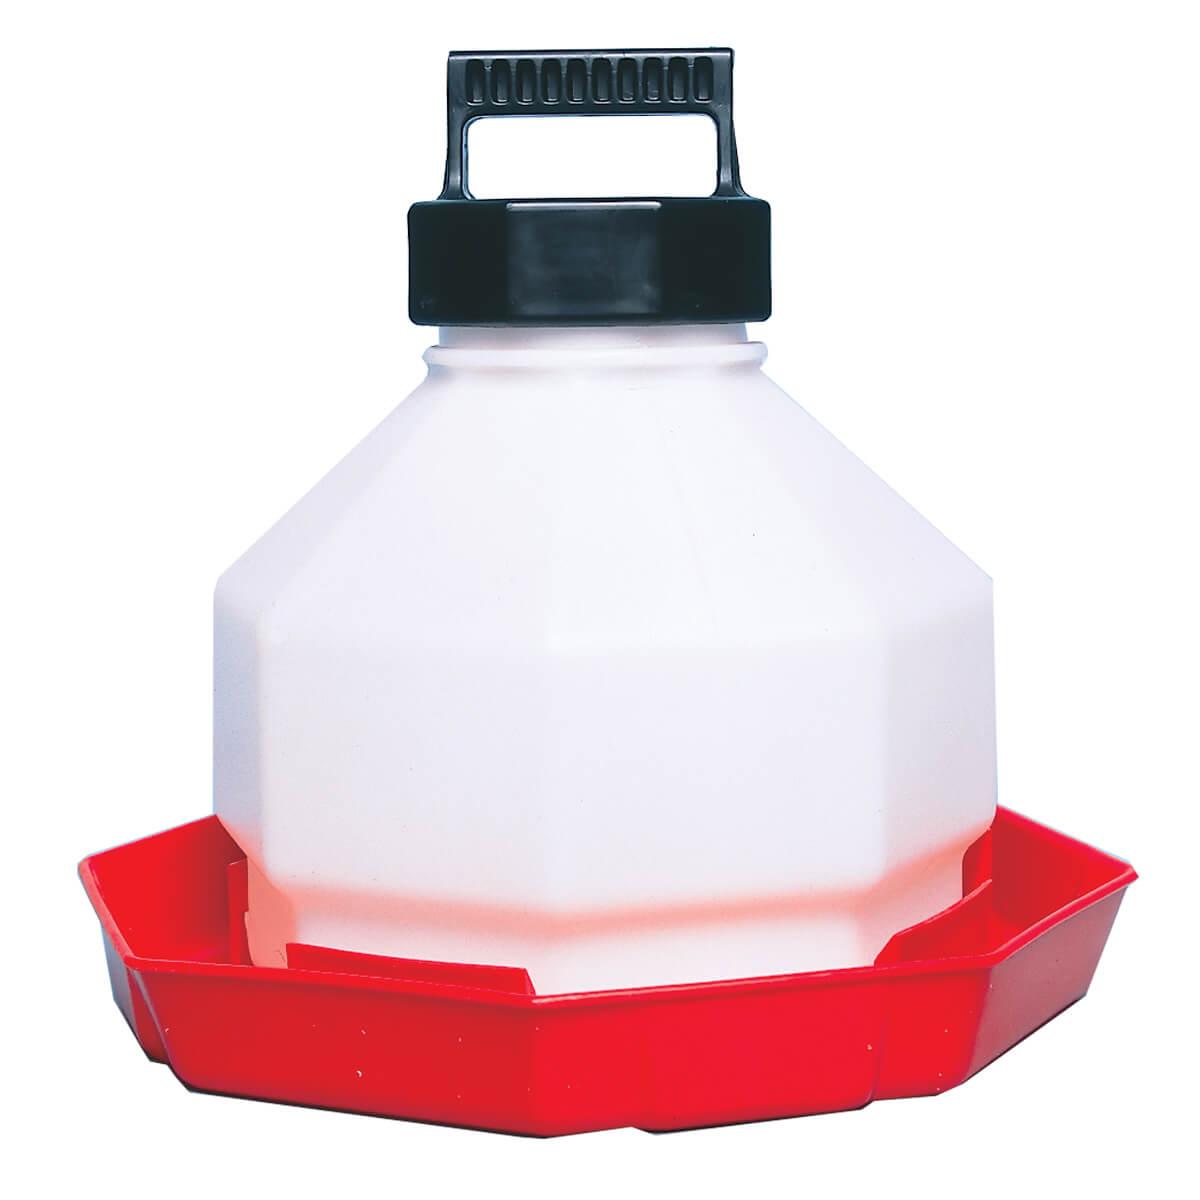 3 Gallon Plastic Poultry Waterer